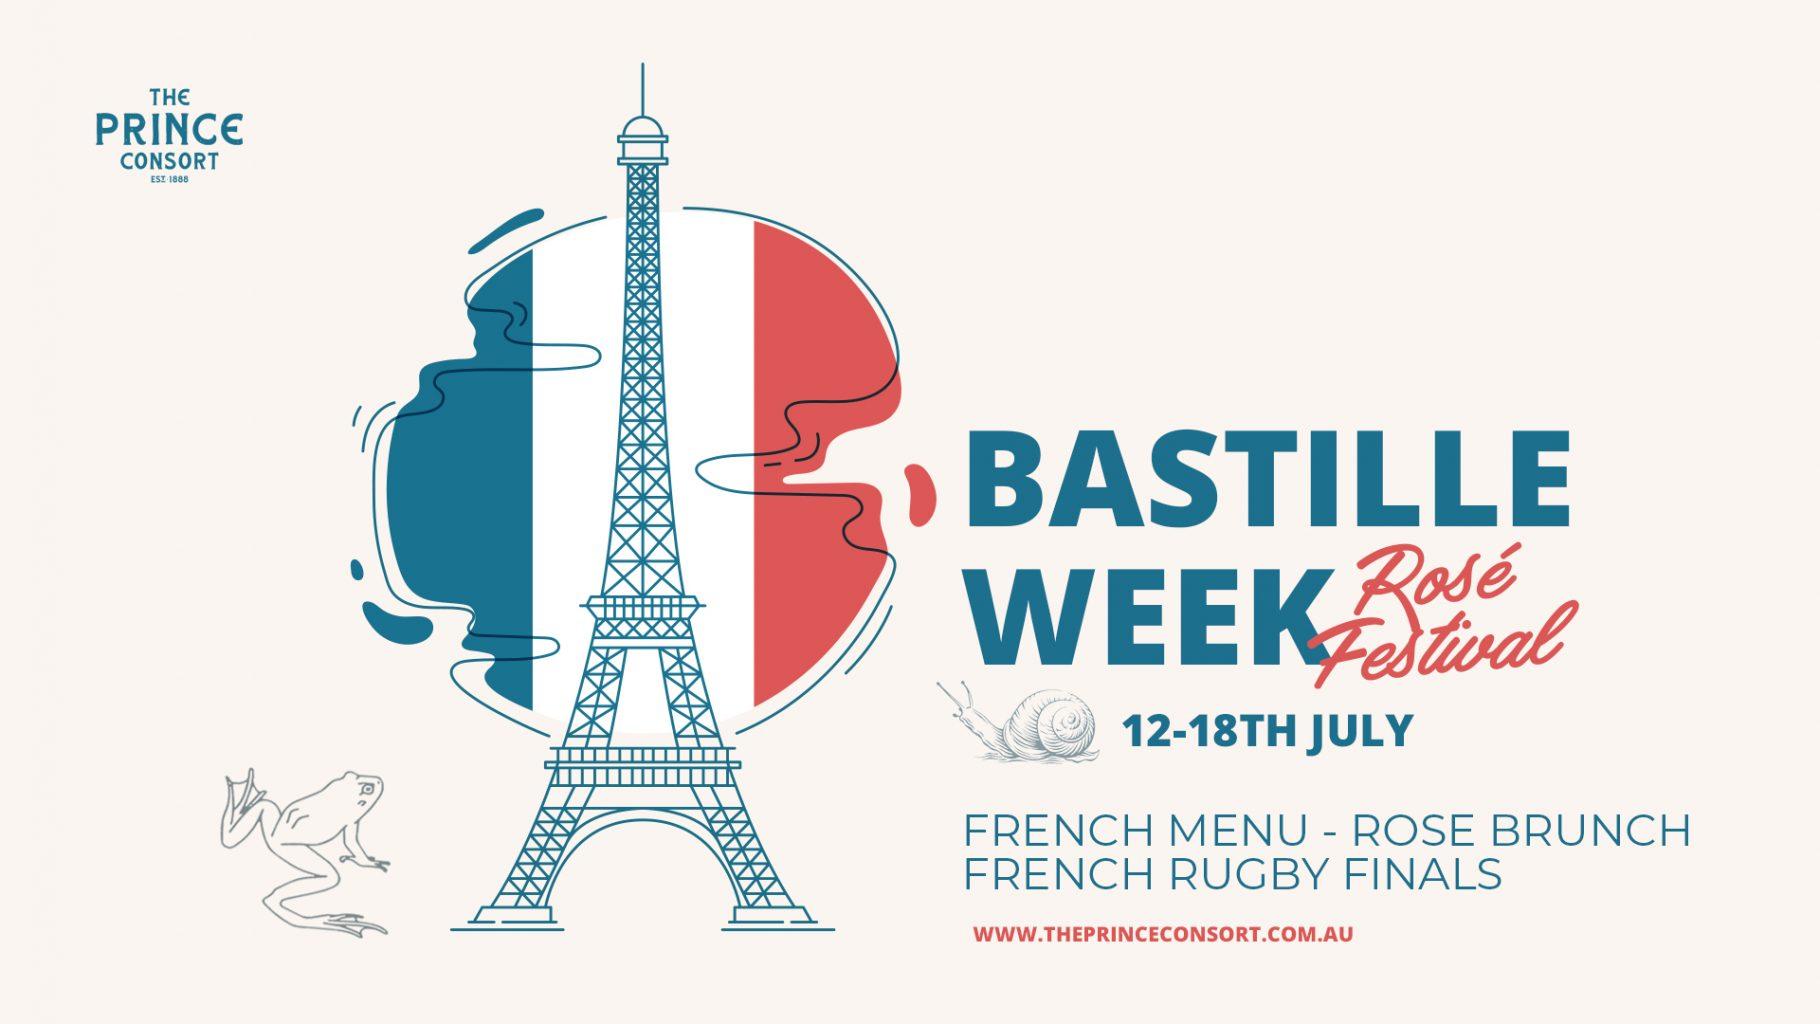 Bastille Week Rose Festival